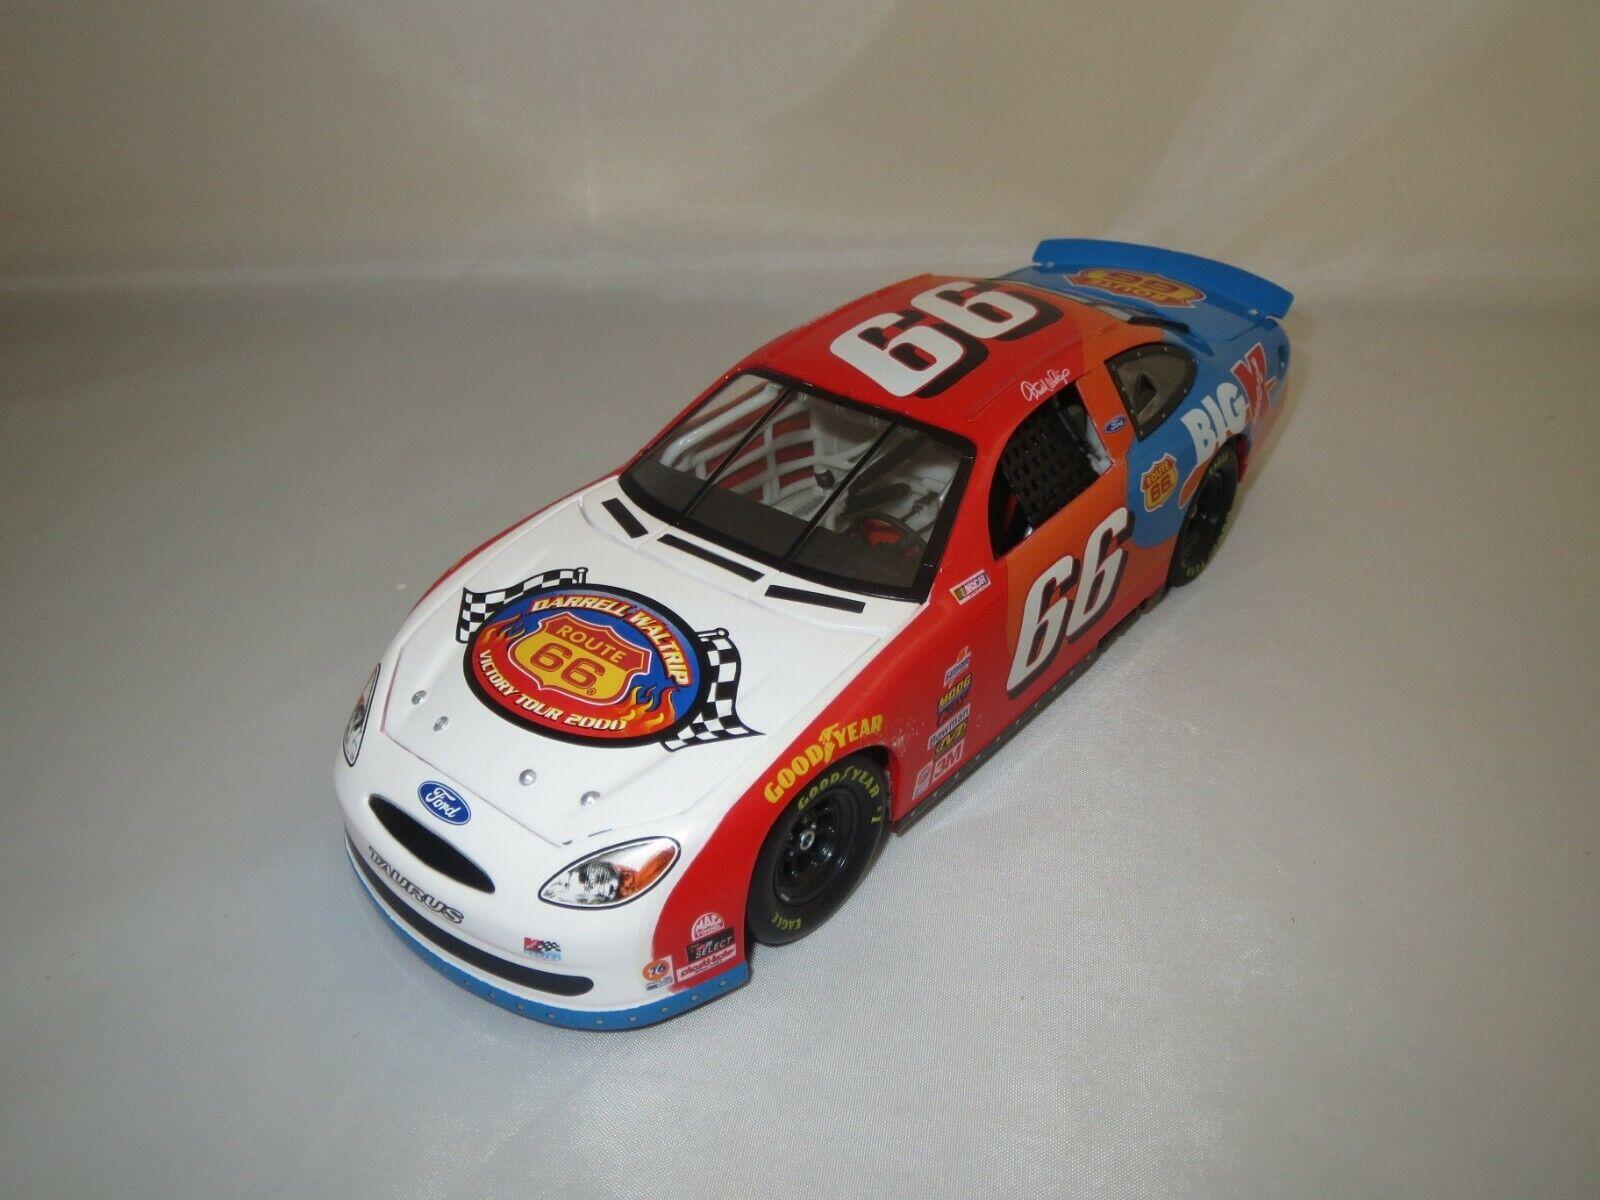 HOT WHEELS Mattel 27366 NASCAR (Darrell Waltrip)  66 1 24 neuf dans sa boîte